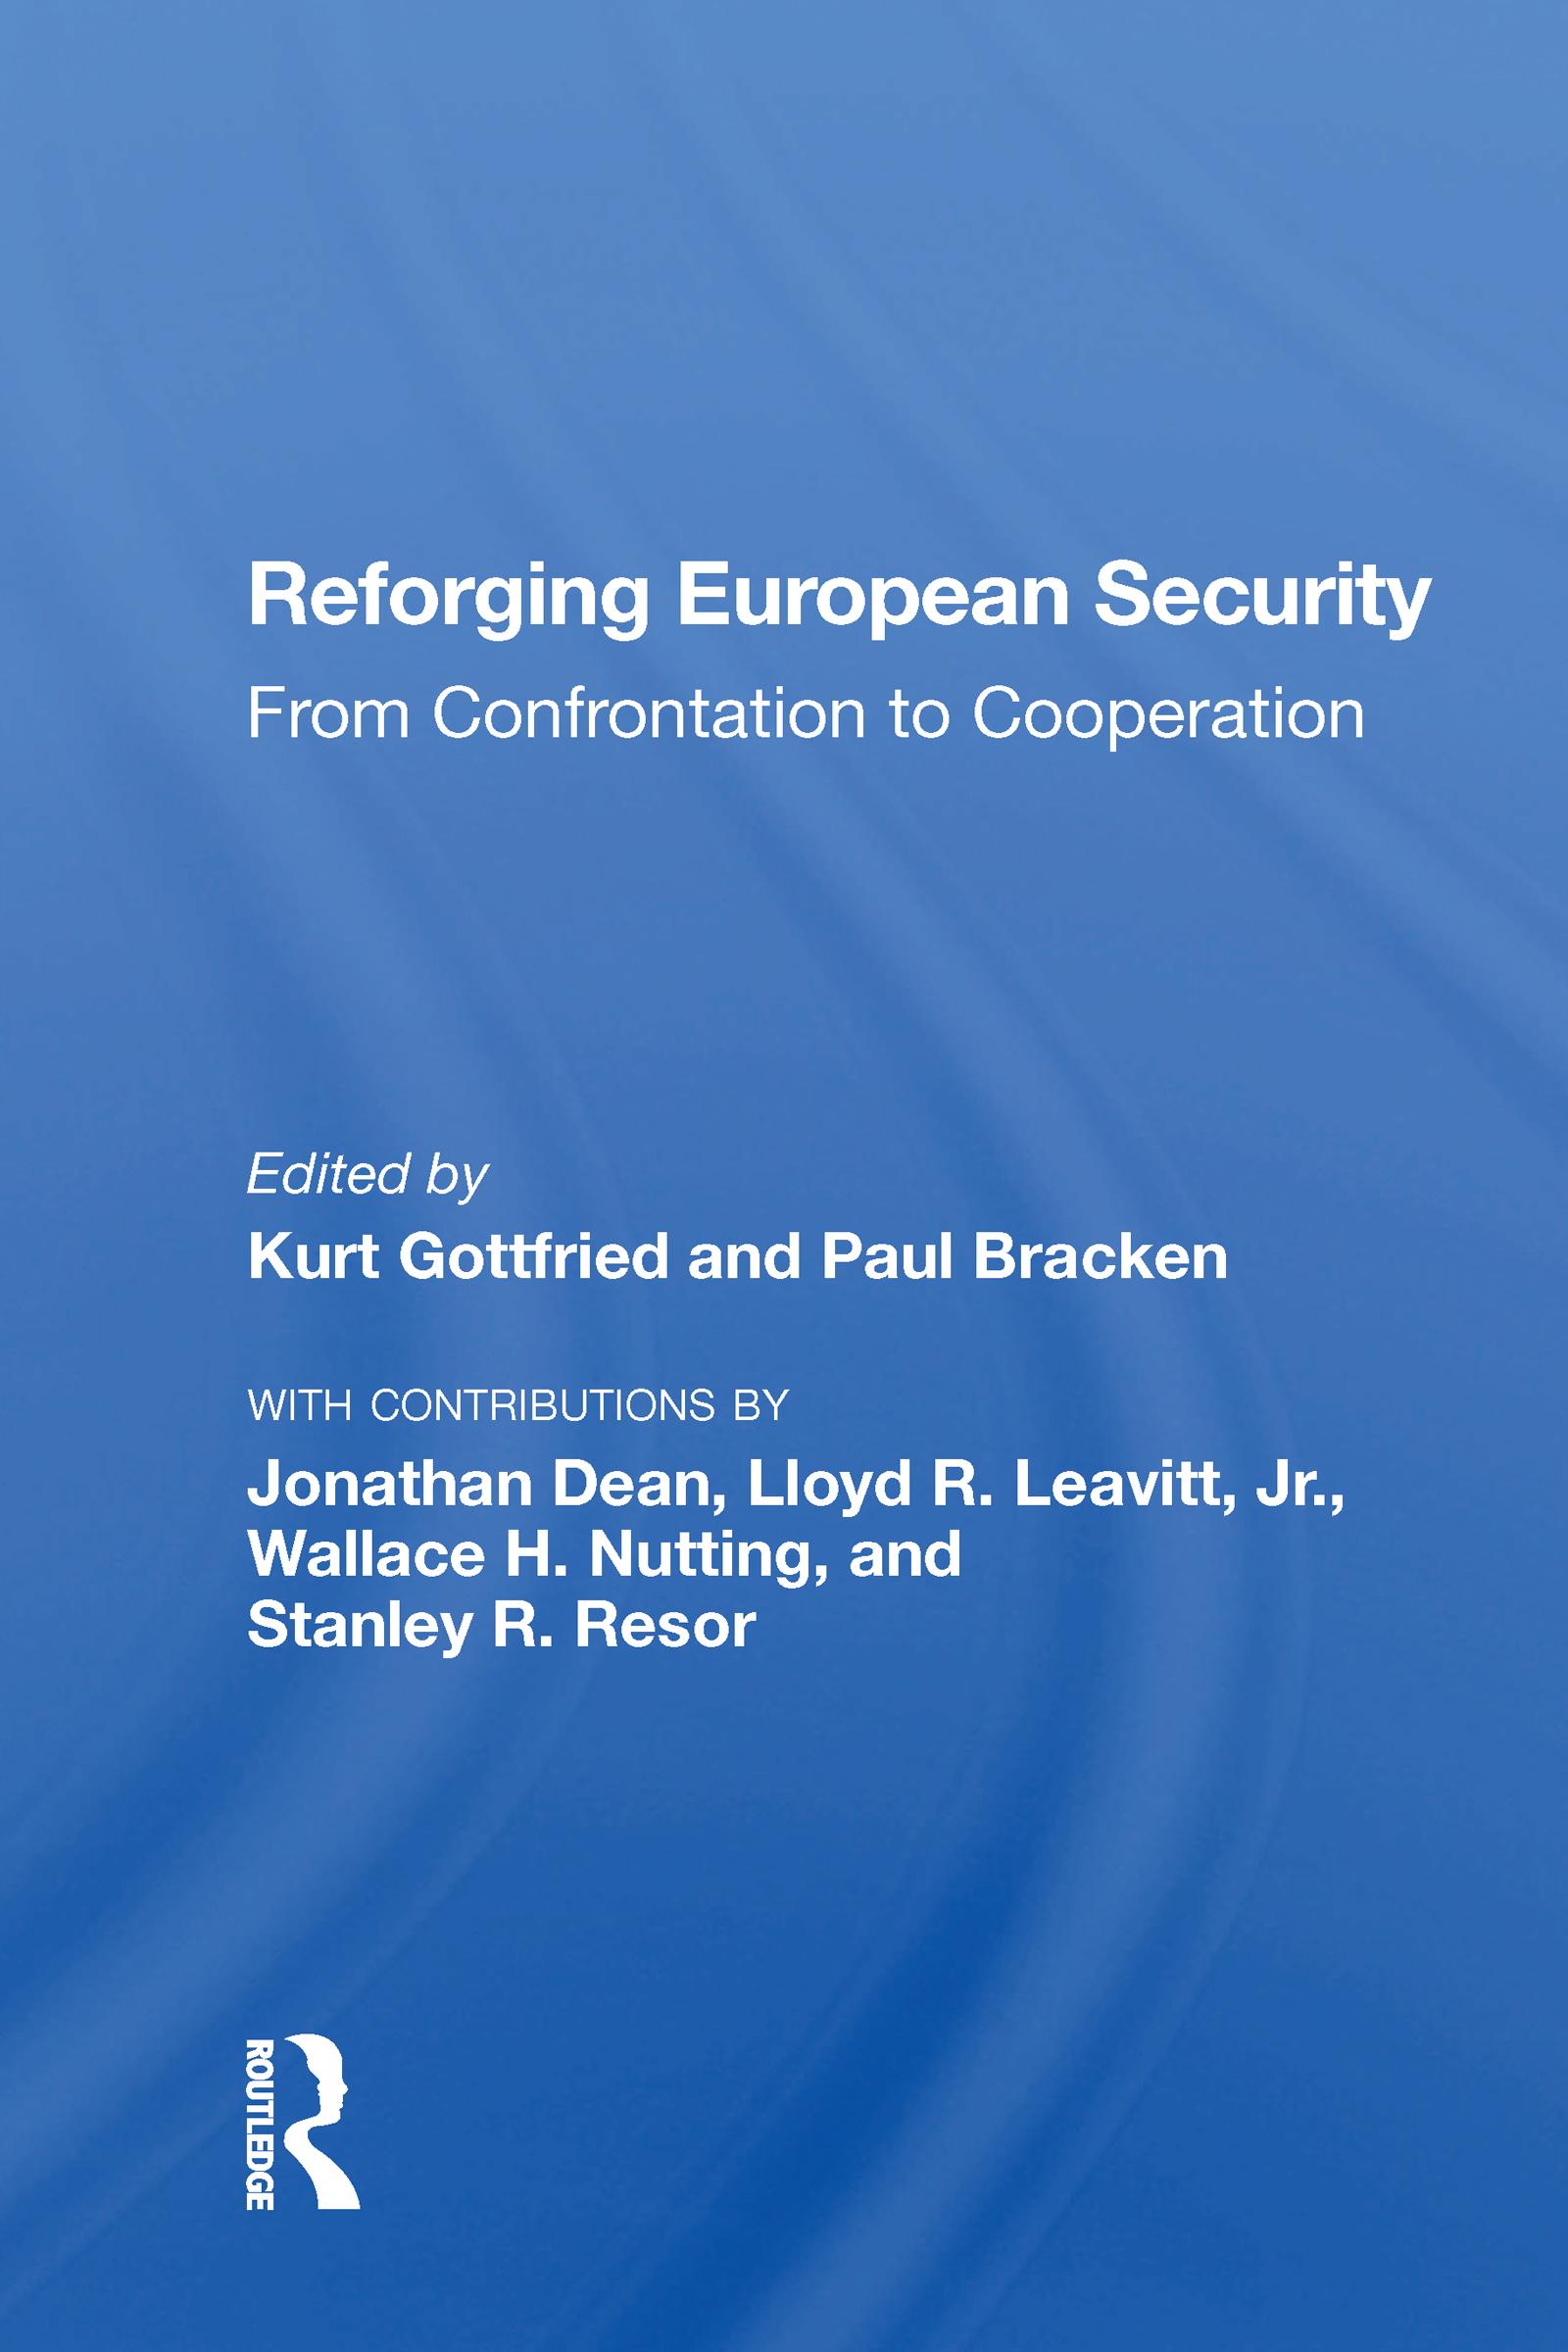 Reforging European Security